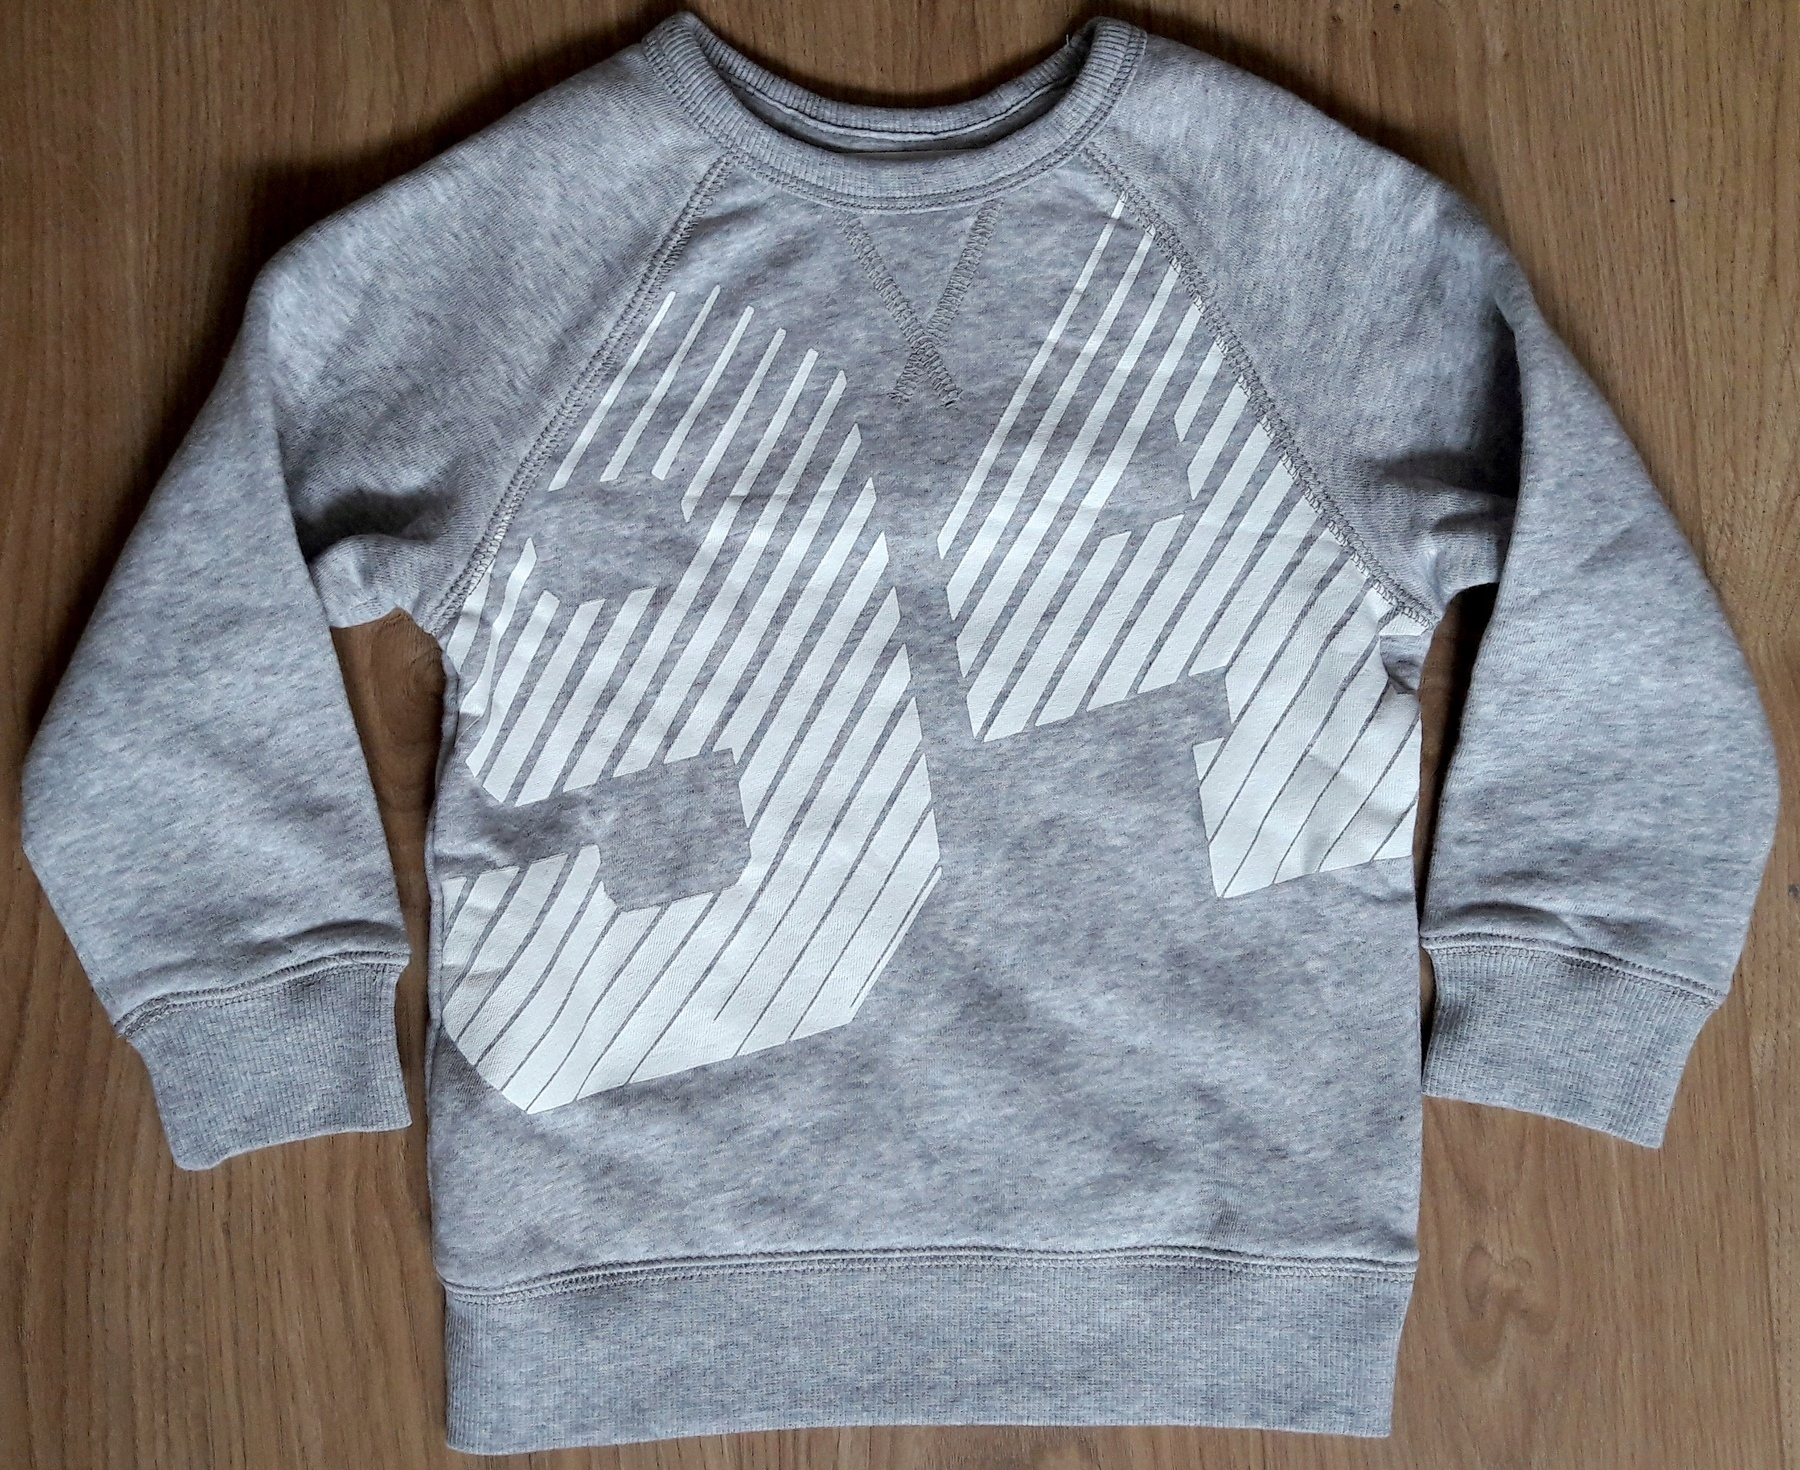 H&M bluza 98/104 NOWA ciepła szara 2-4 lata